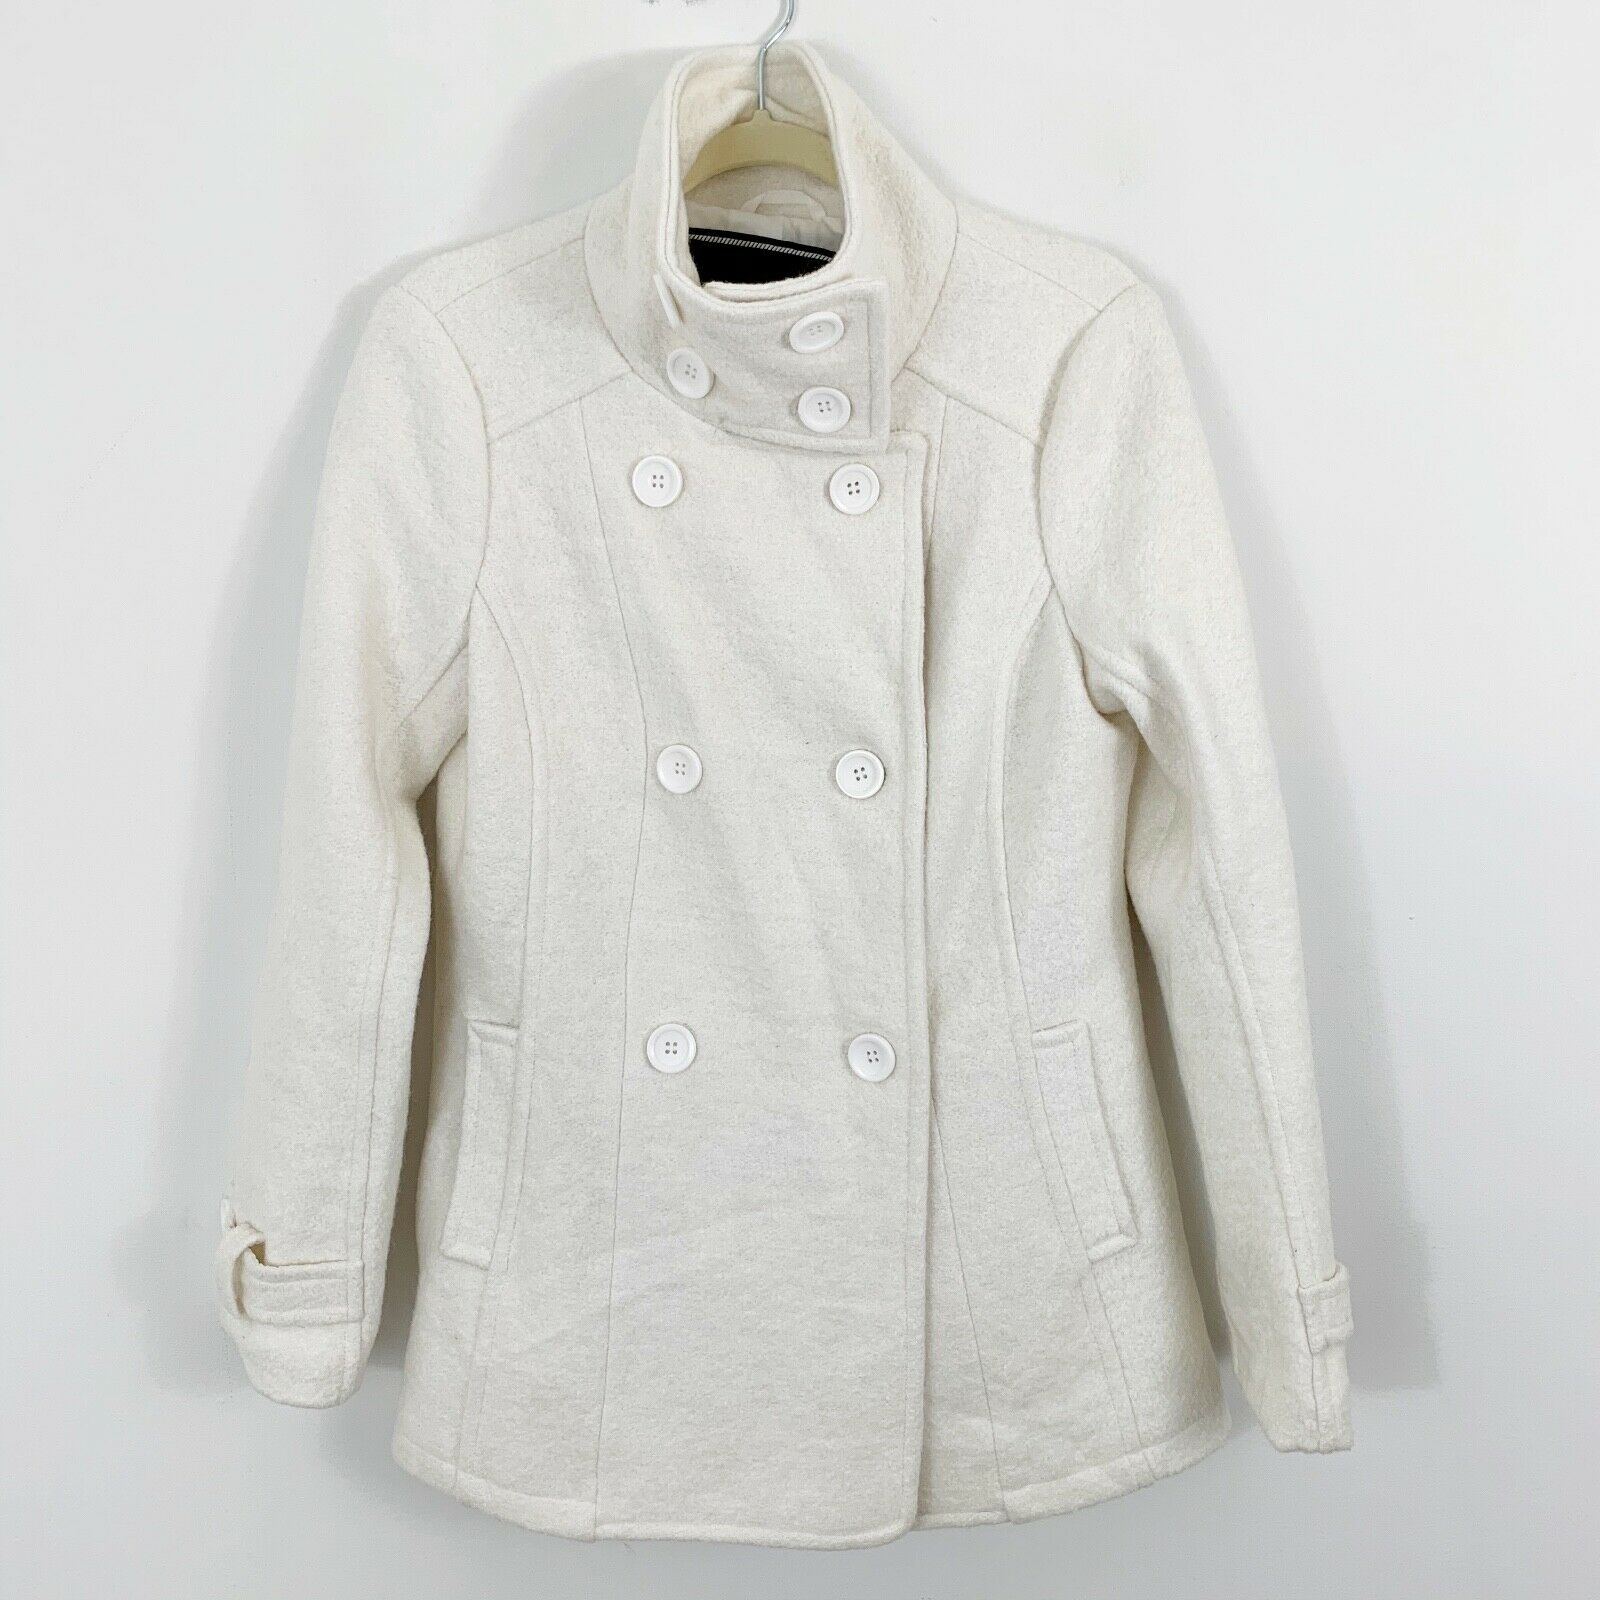 BNCI Blanc Noir Womens Medium Winter White Wool Blend Textured Pea Coat Jacket